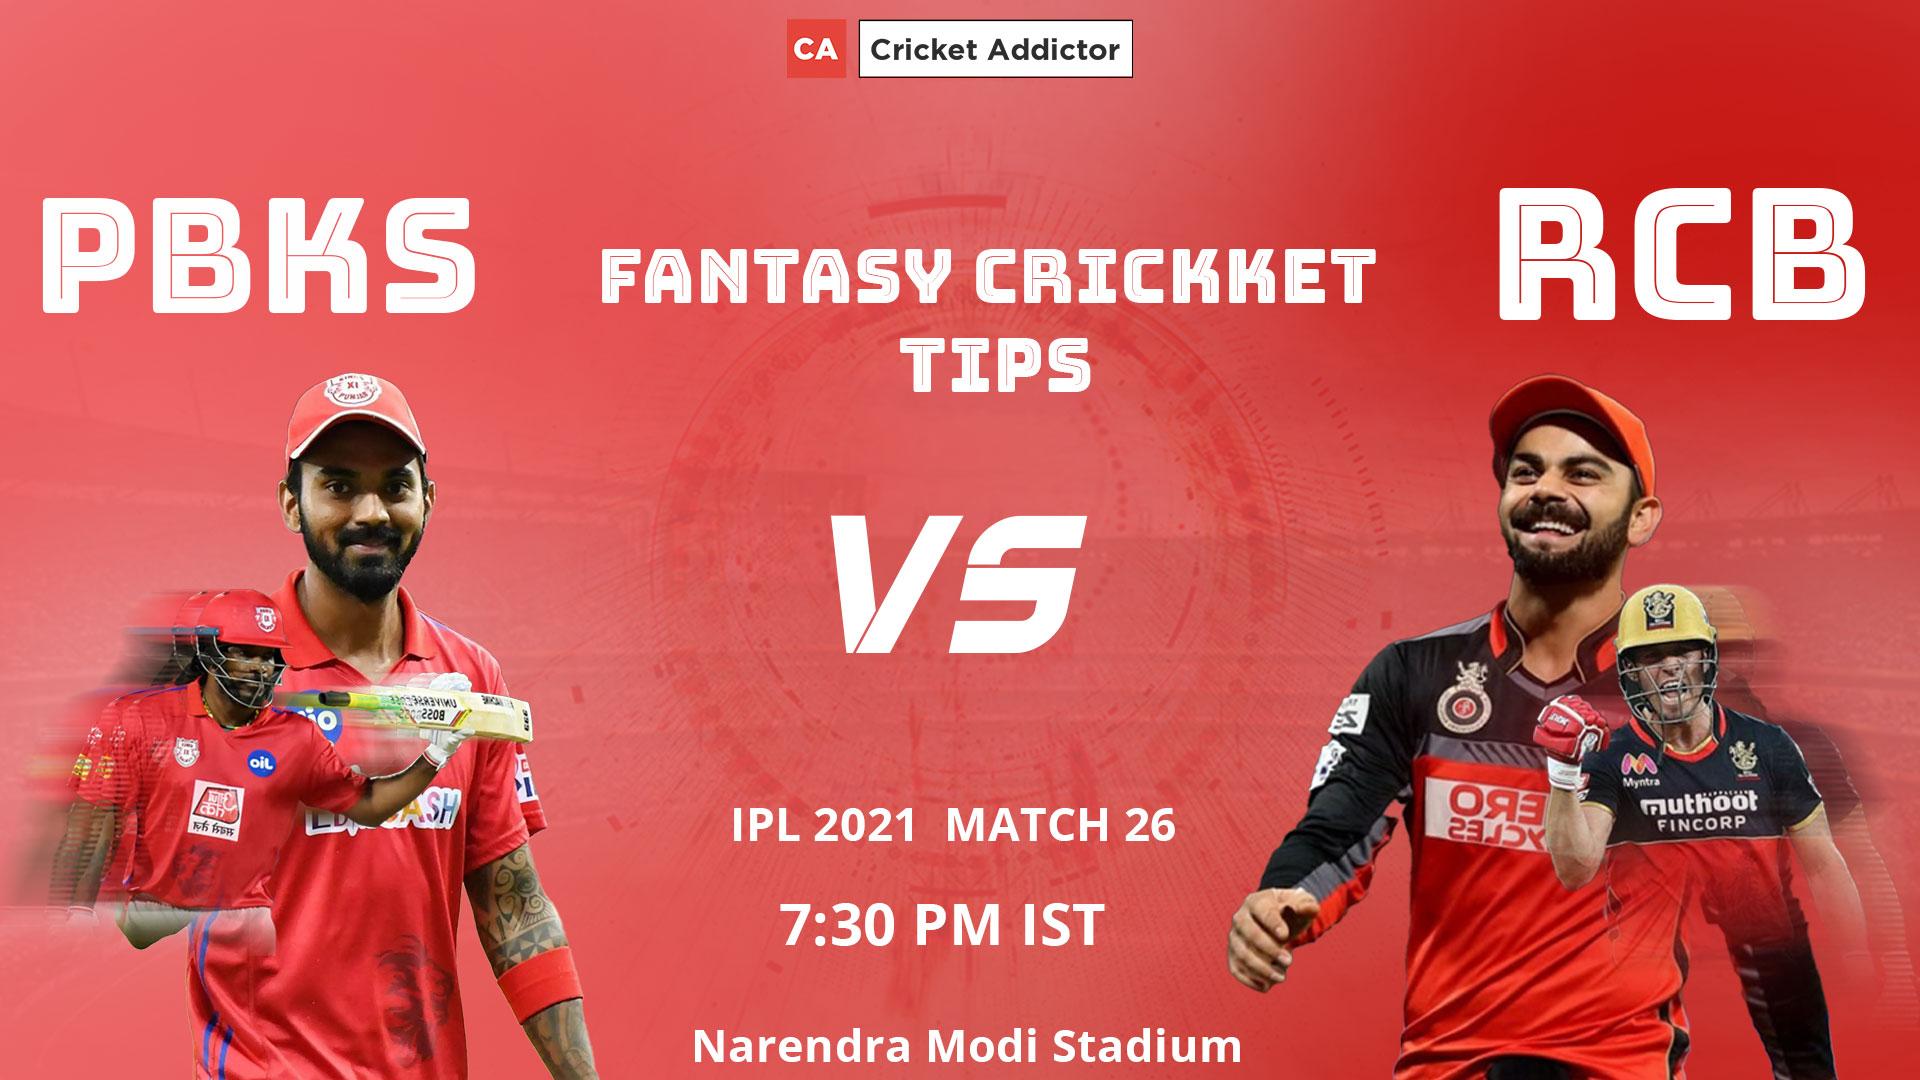 Punjab Kings (PBKS) vs Royal Challengers Bangalore (RCB) Dream11 Prediction, Fantasy Cricket Tips, Playing XI, Pitch Report, Dream11 Team, Injury Update of VIVO IPL 2021.